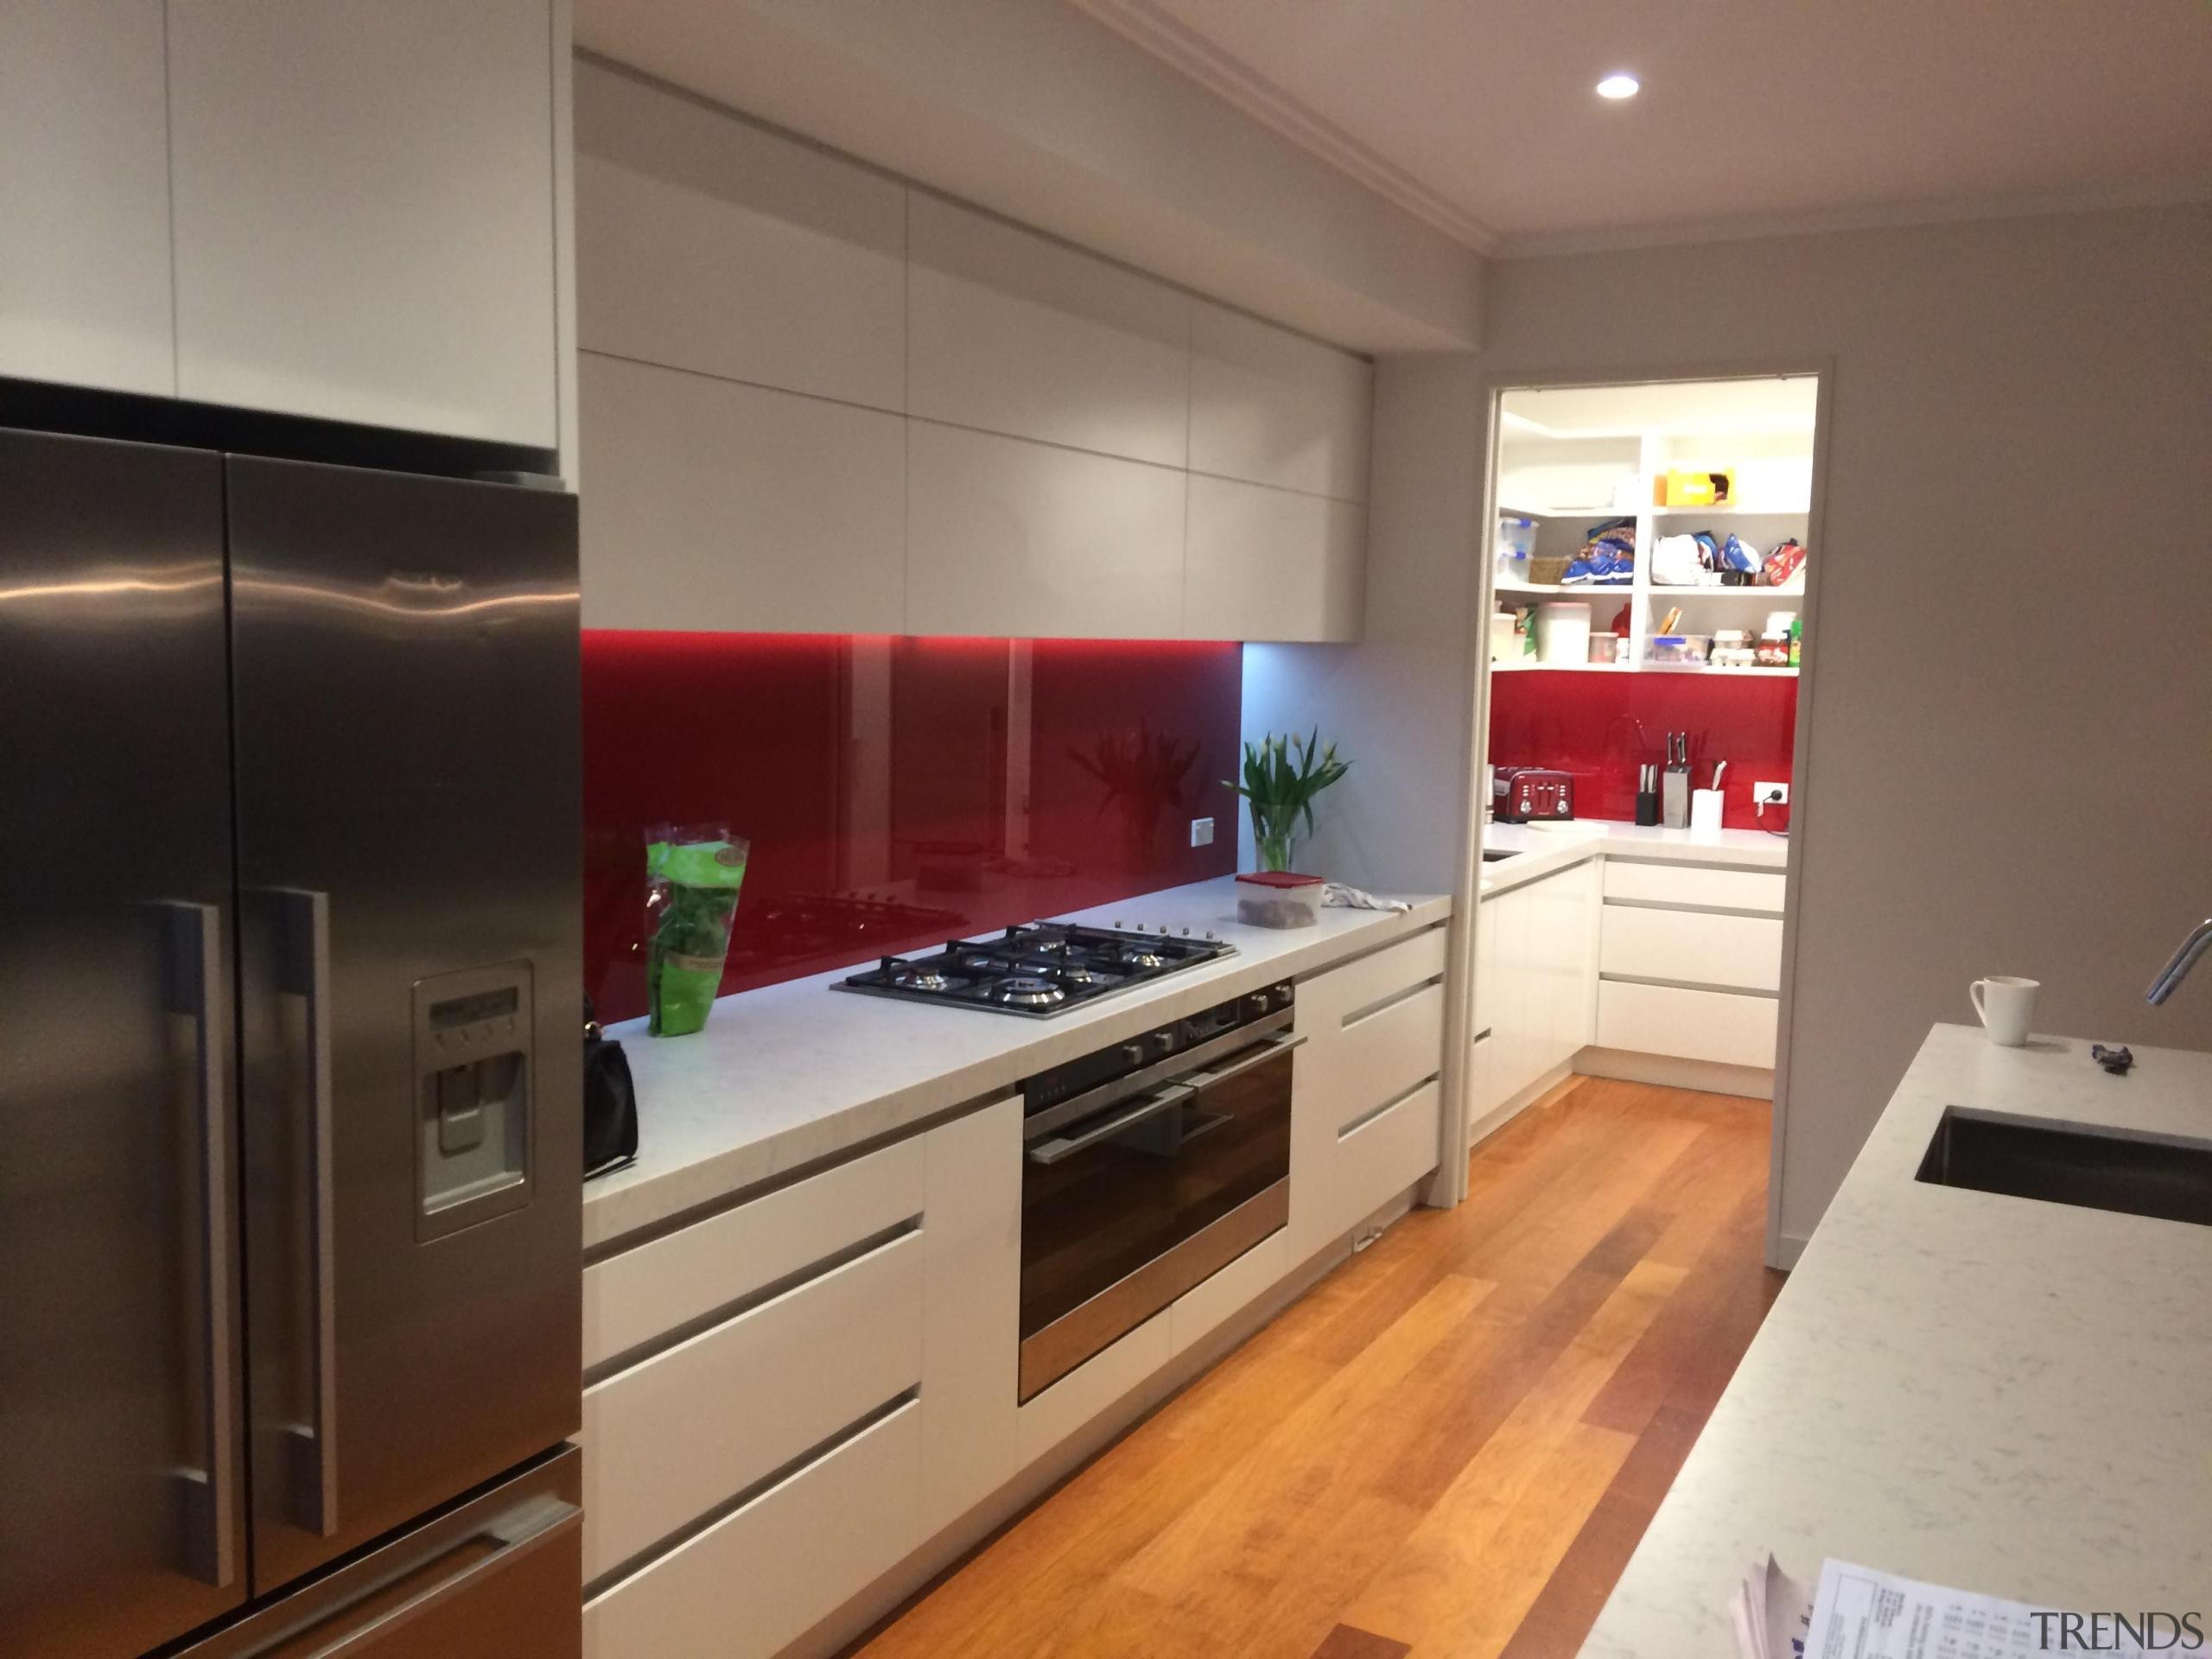 whitford photo.jpg - whitford_photo.jpg - cabinetry | countertop cabinetry, countertop, interior design, kitchen, property, real estate, room, gray, brown